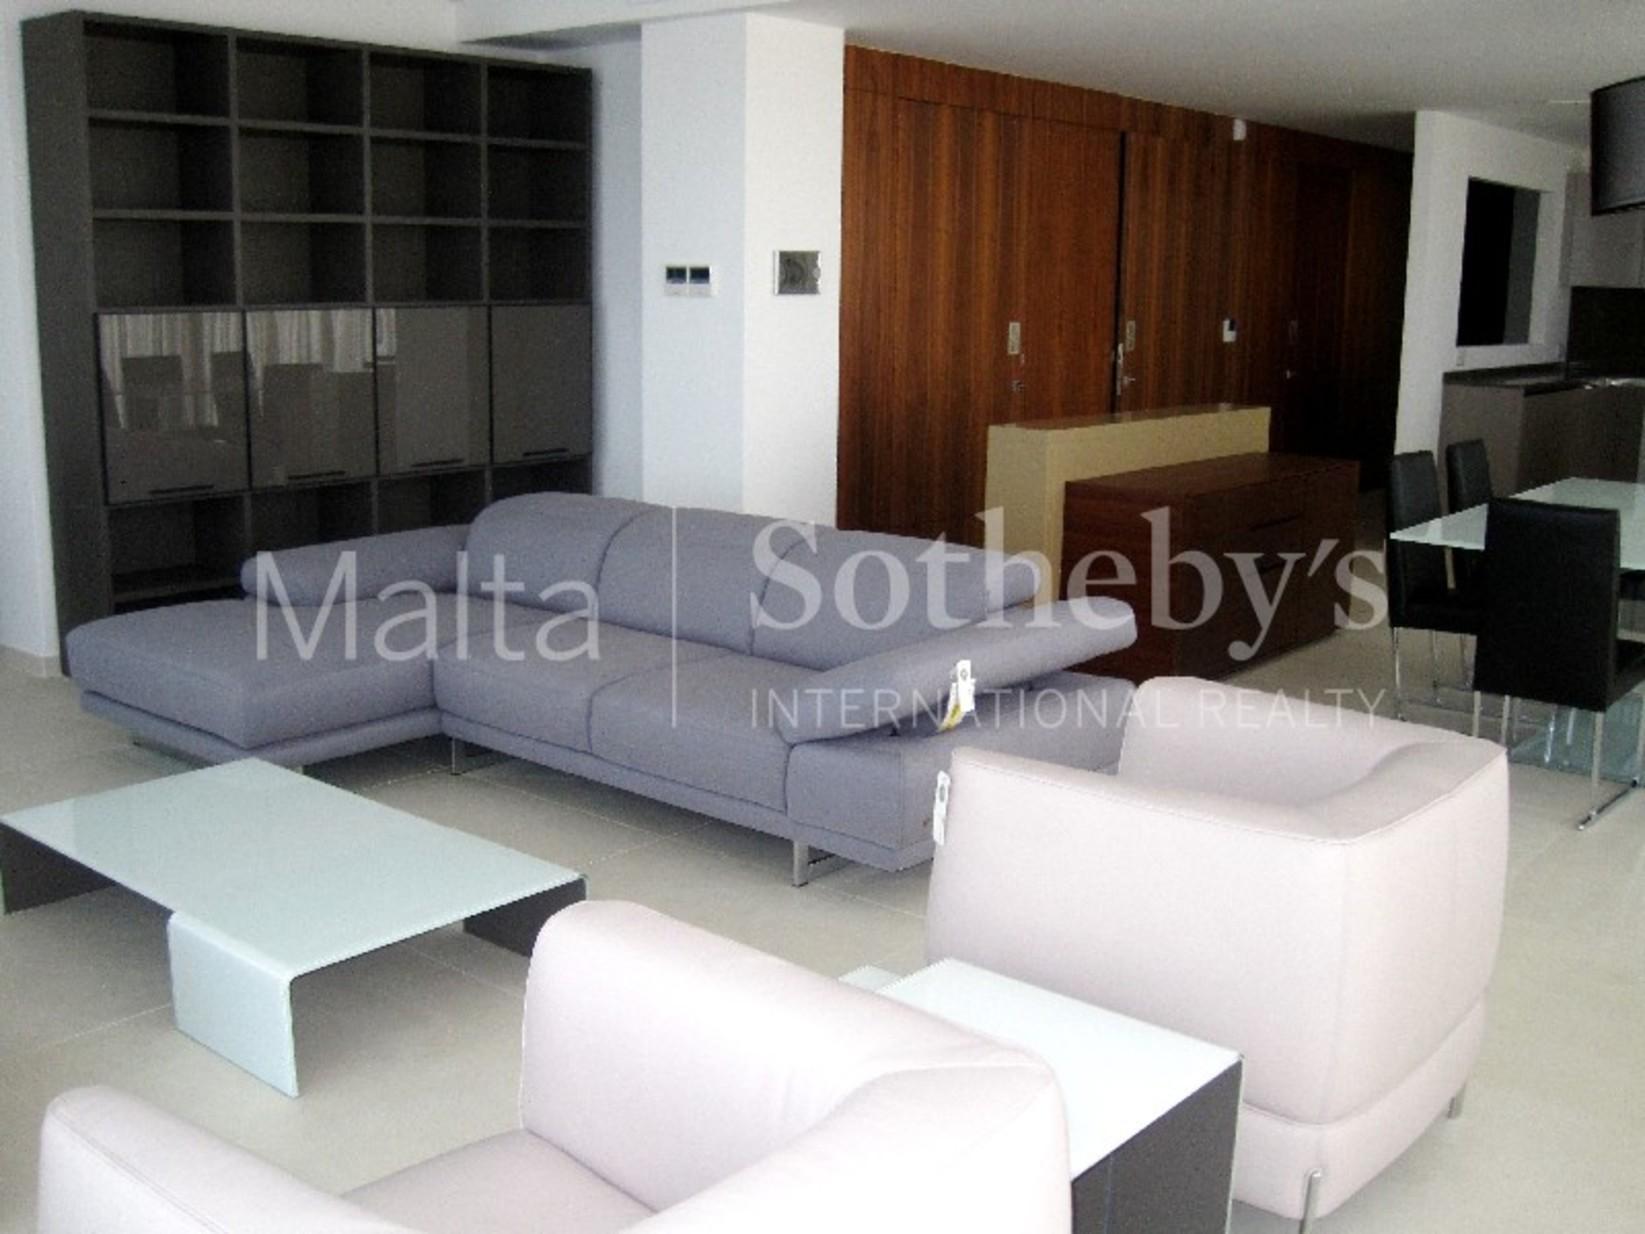 4 bed Apartment For Rent in Sliema, Sliema - thumb 3